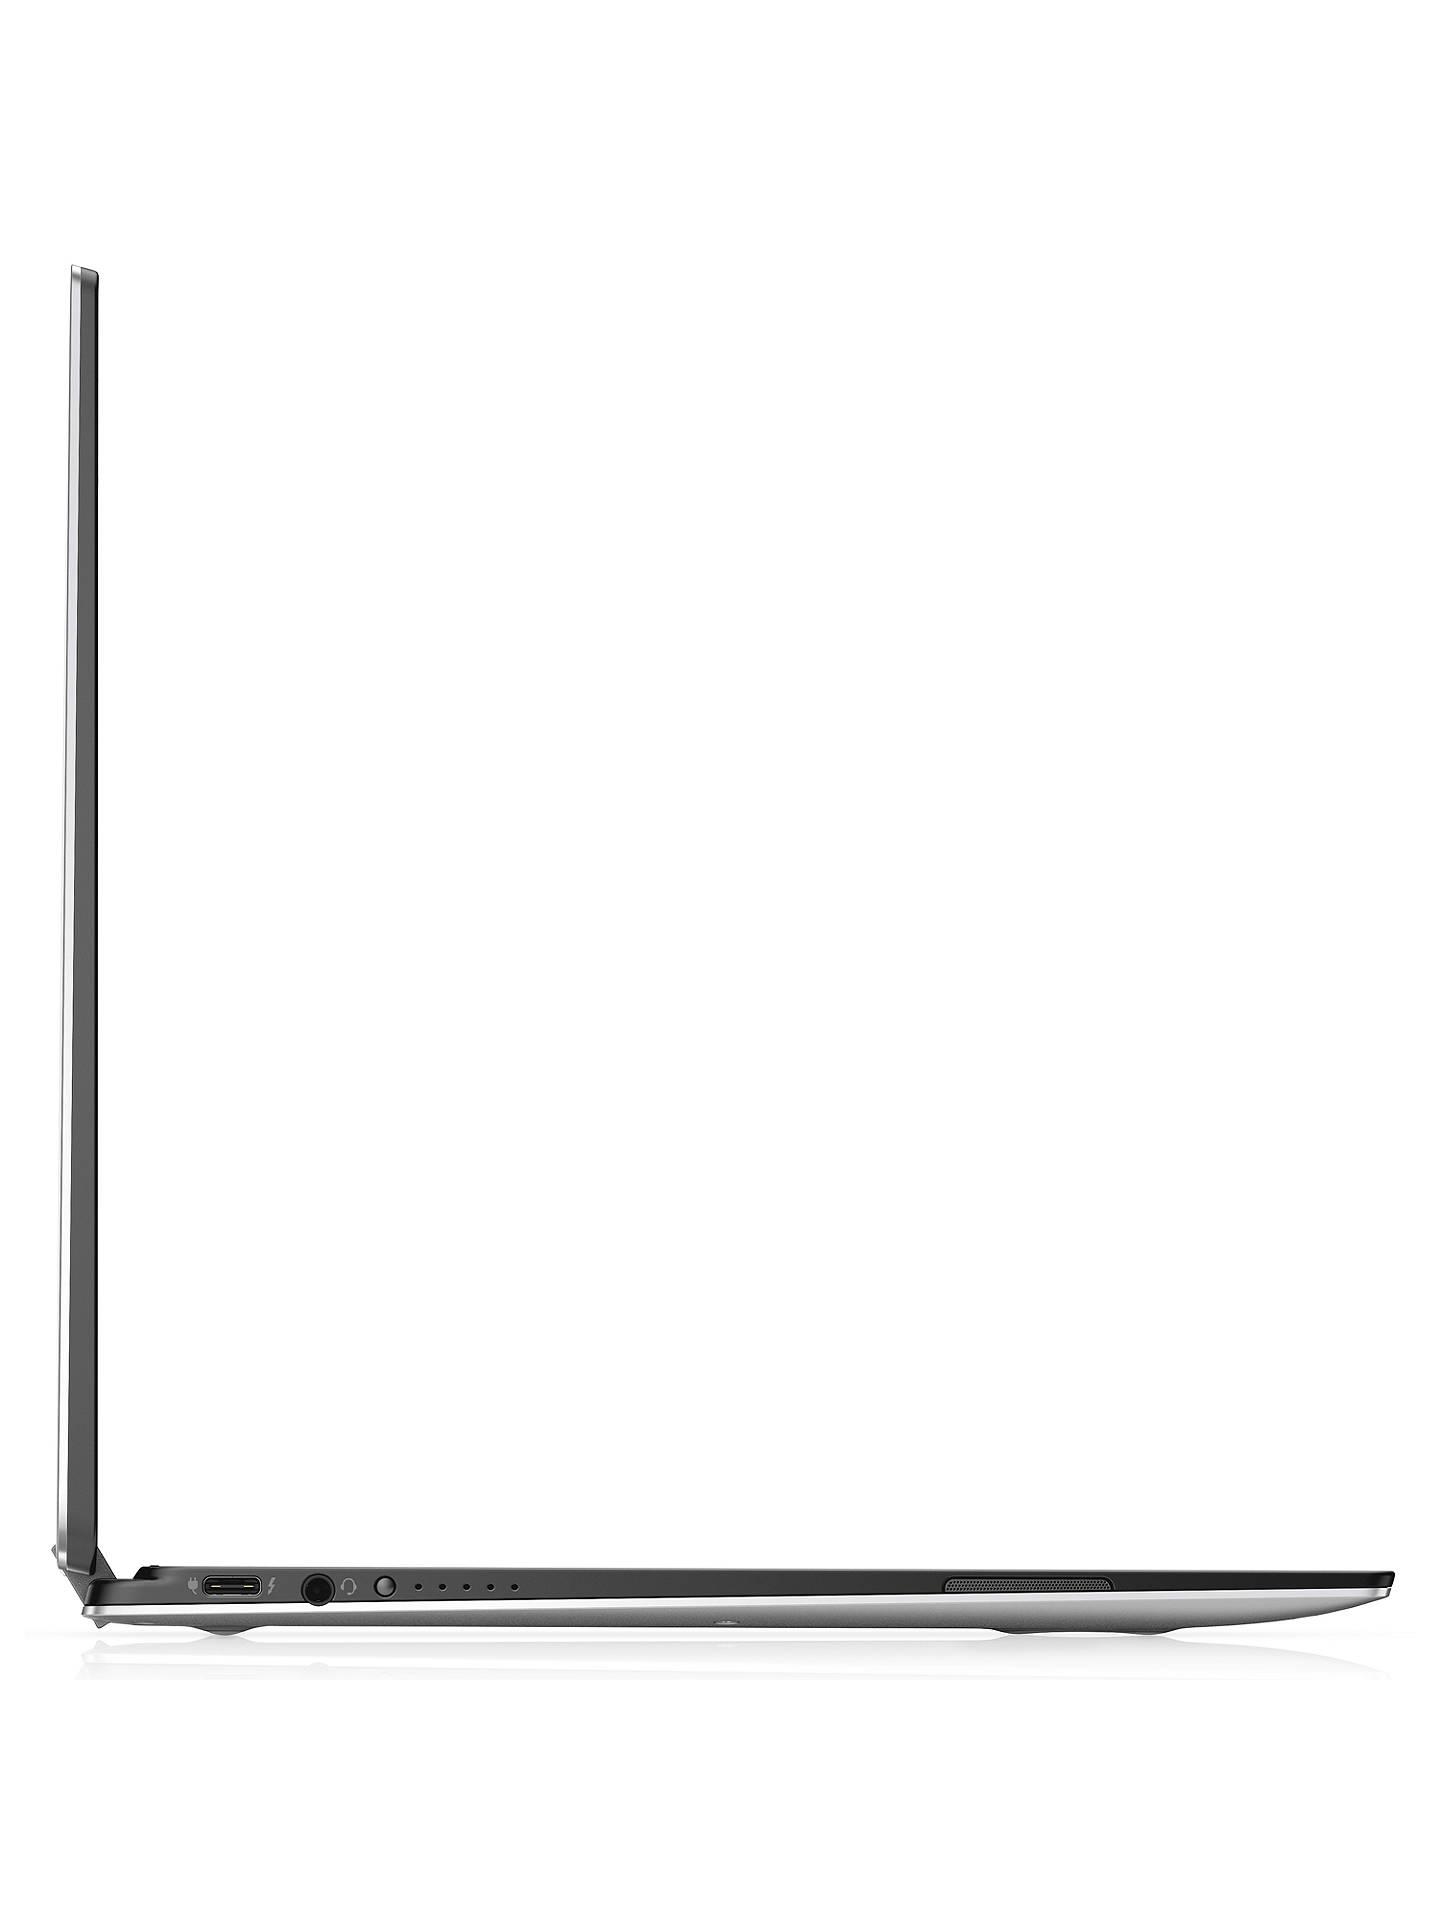 Dell XPS 13 Convertible Laptop, Intel Core i5, 8GB RAM